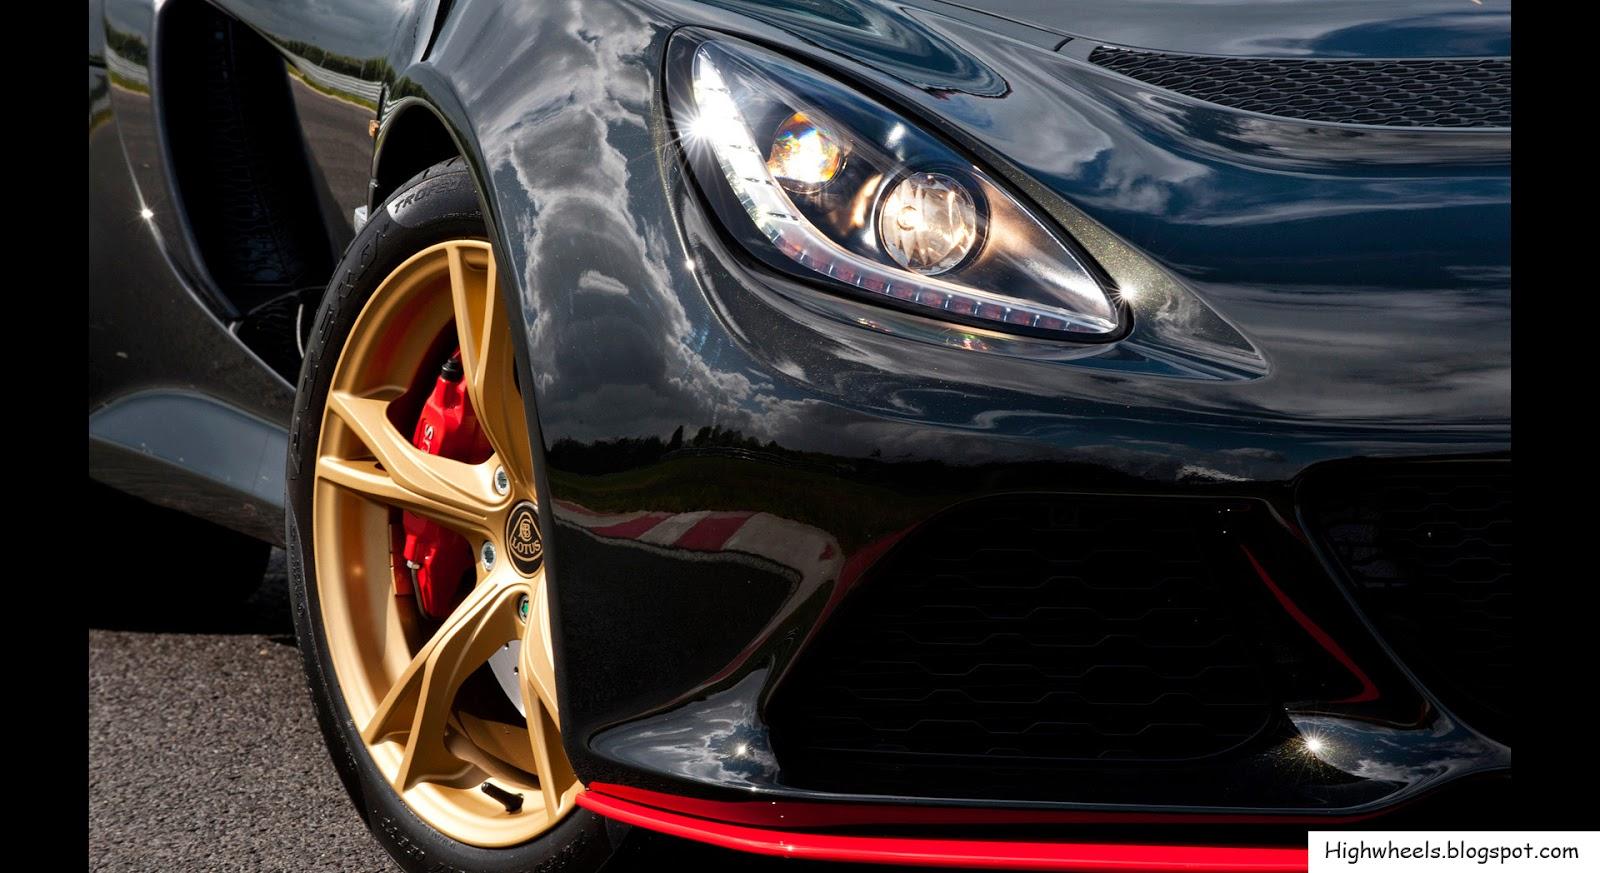 Smart car review: 2014 Lotus Exige LF1